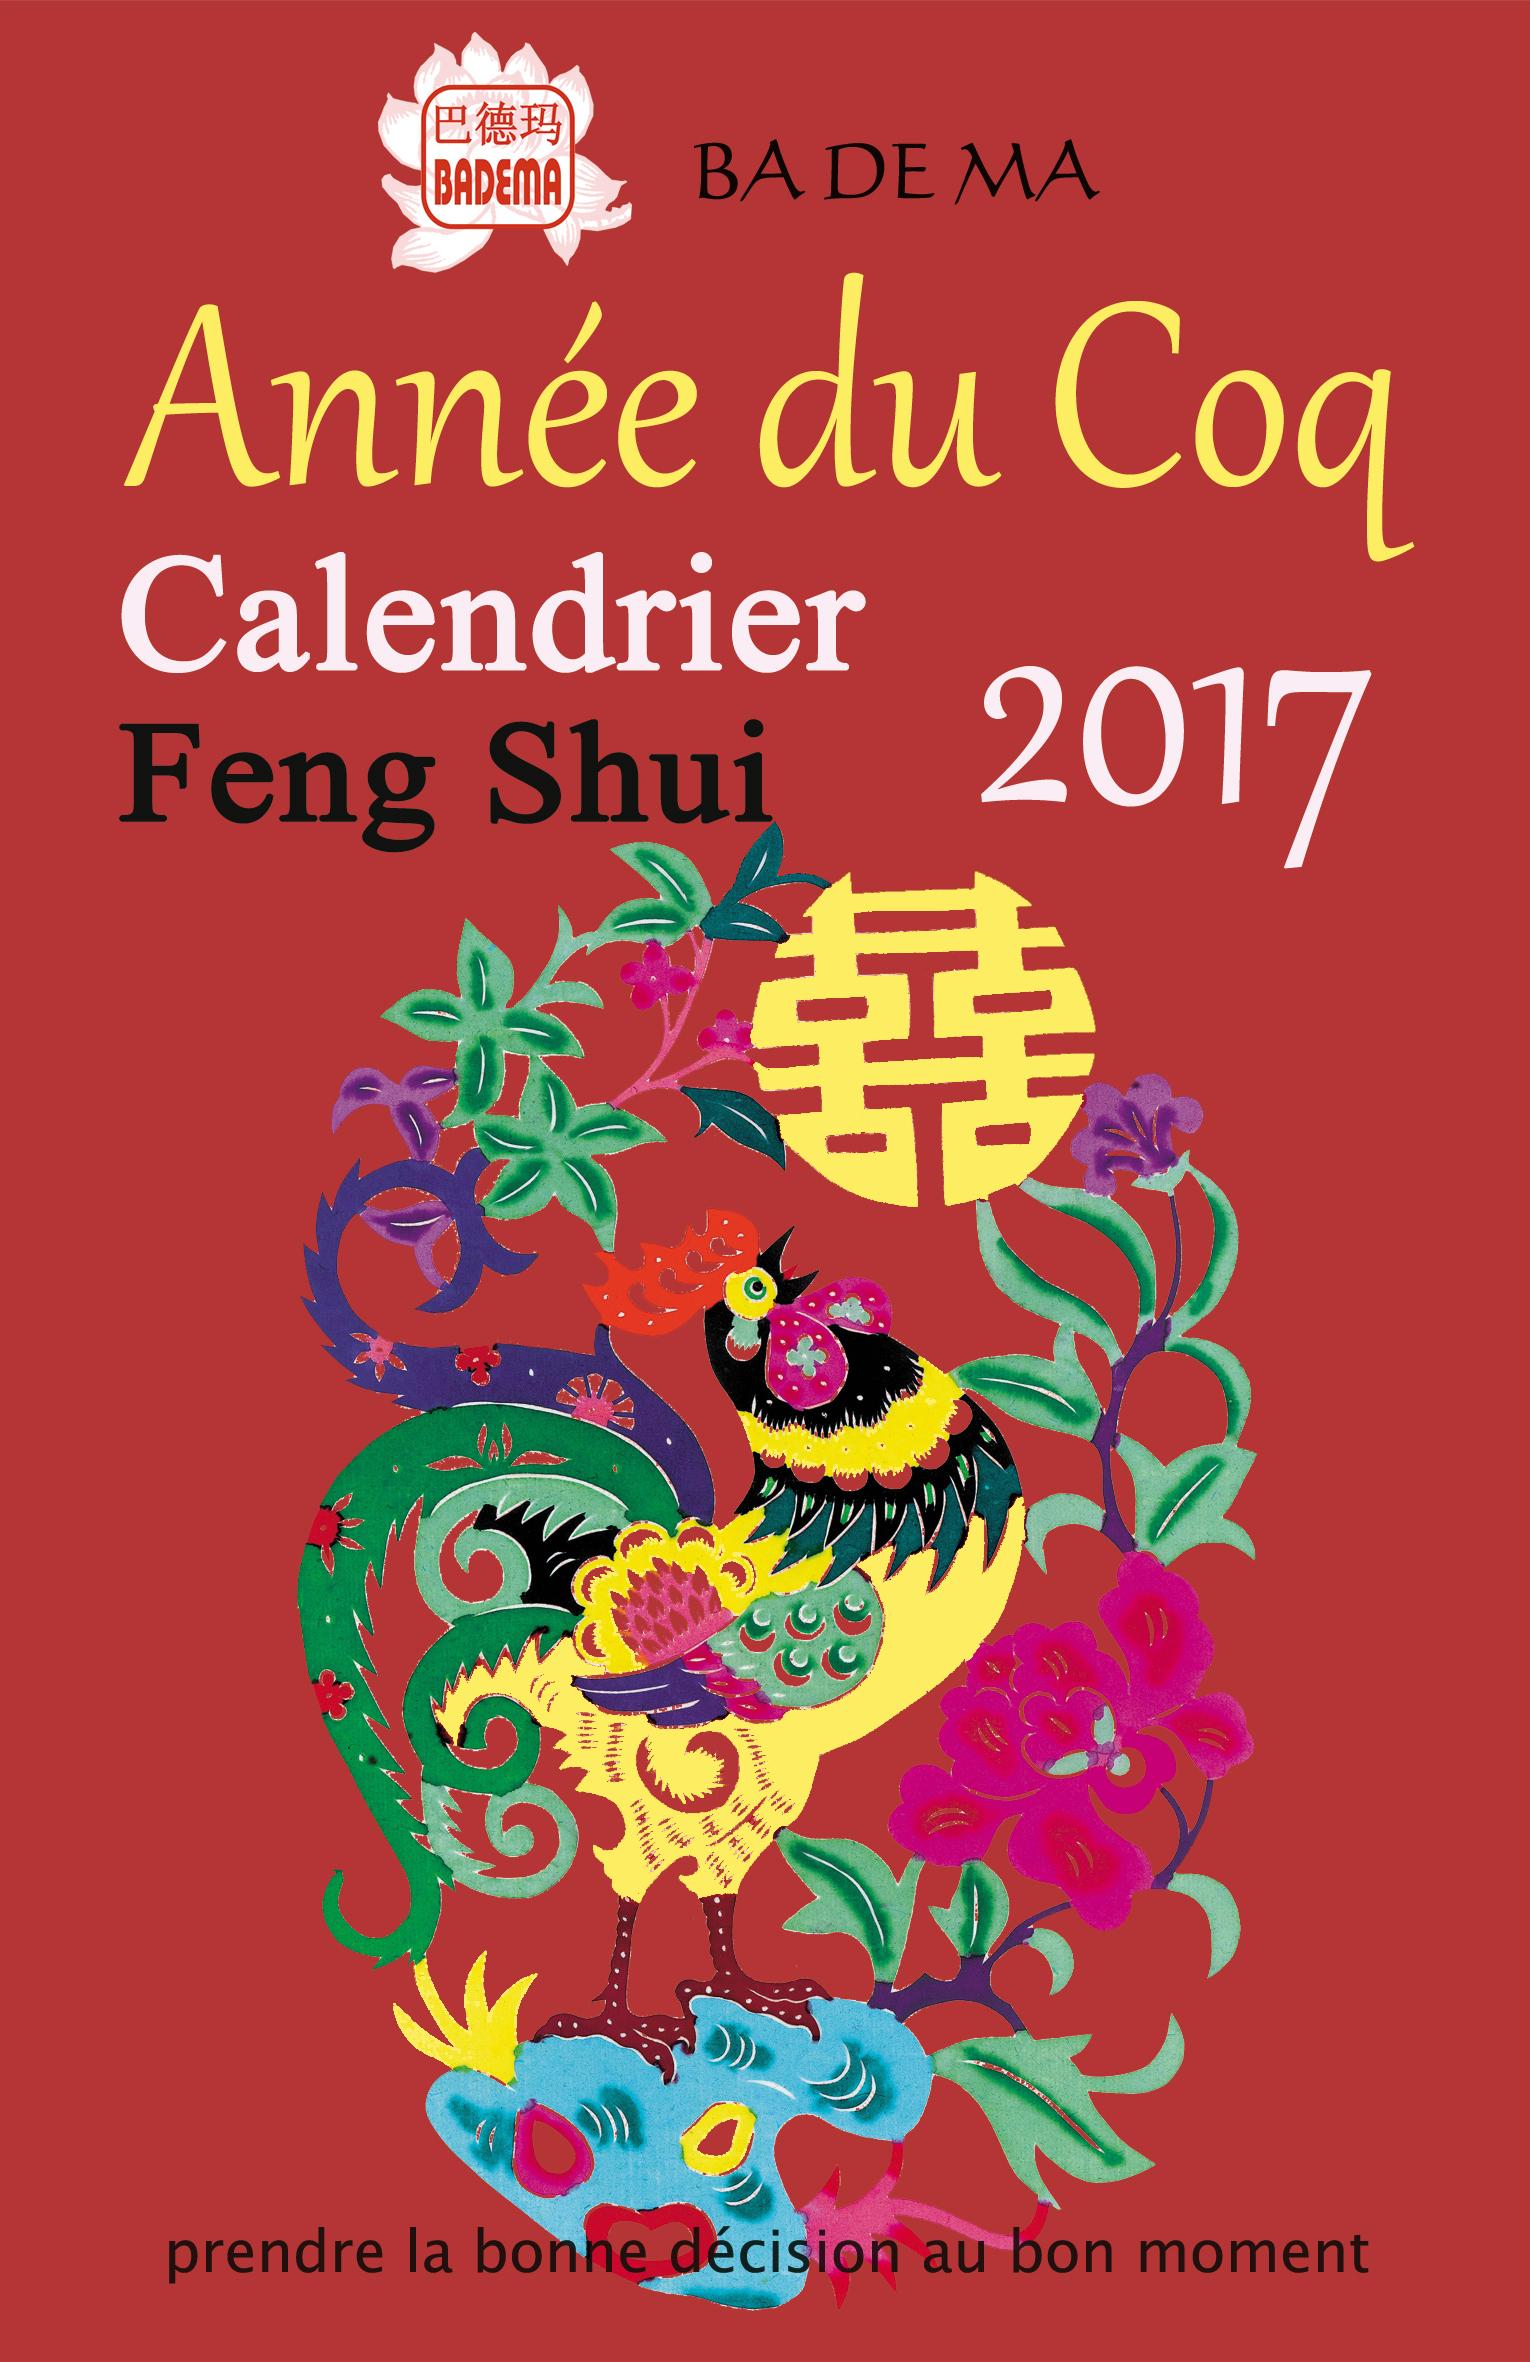 CALENDRIER FENG SHUI 2017 - L'ANNEE DU COQ